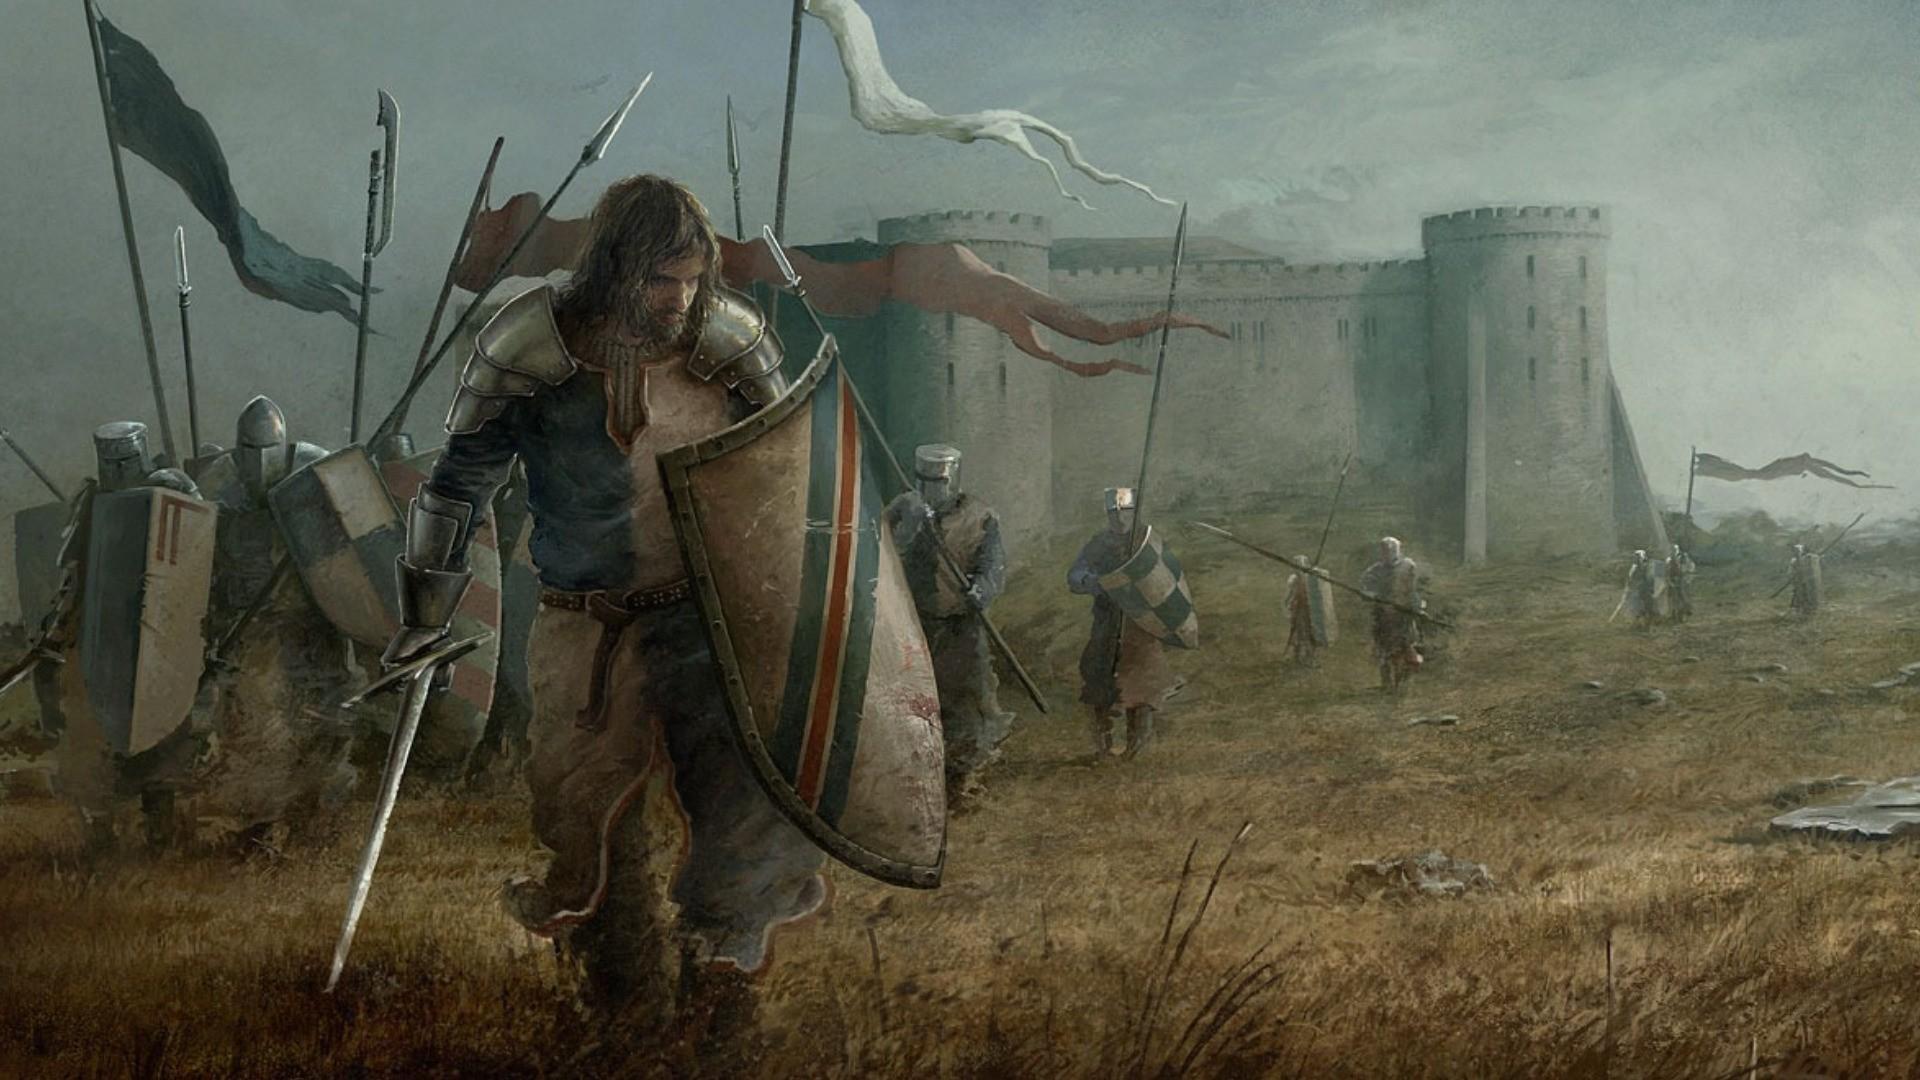 Knights Life